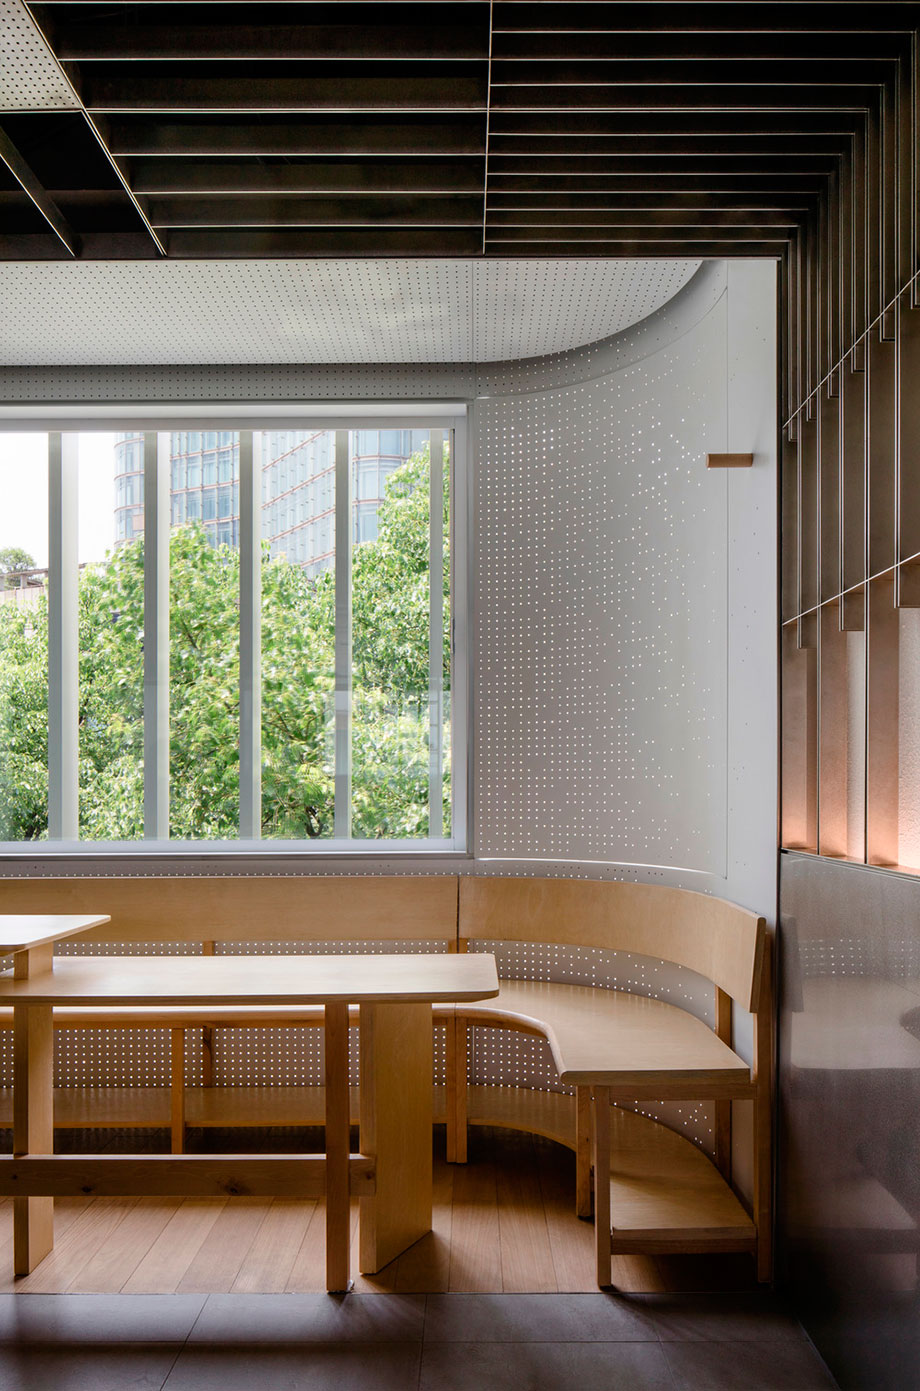 the zentral kitchen de lukstudio (7) - foto peter dixie